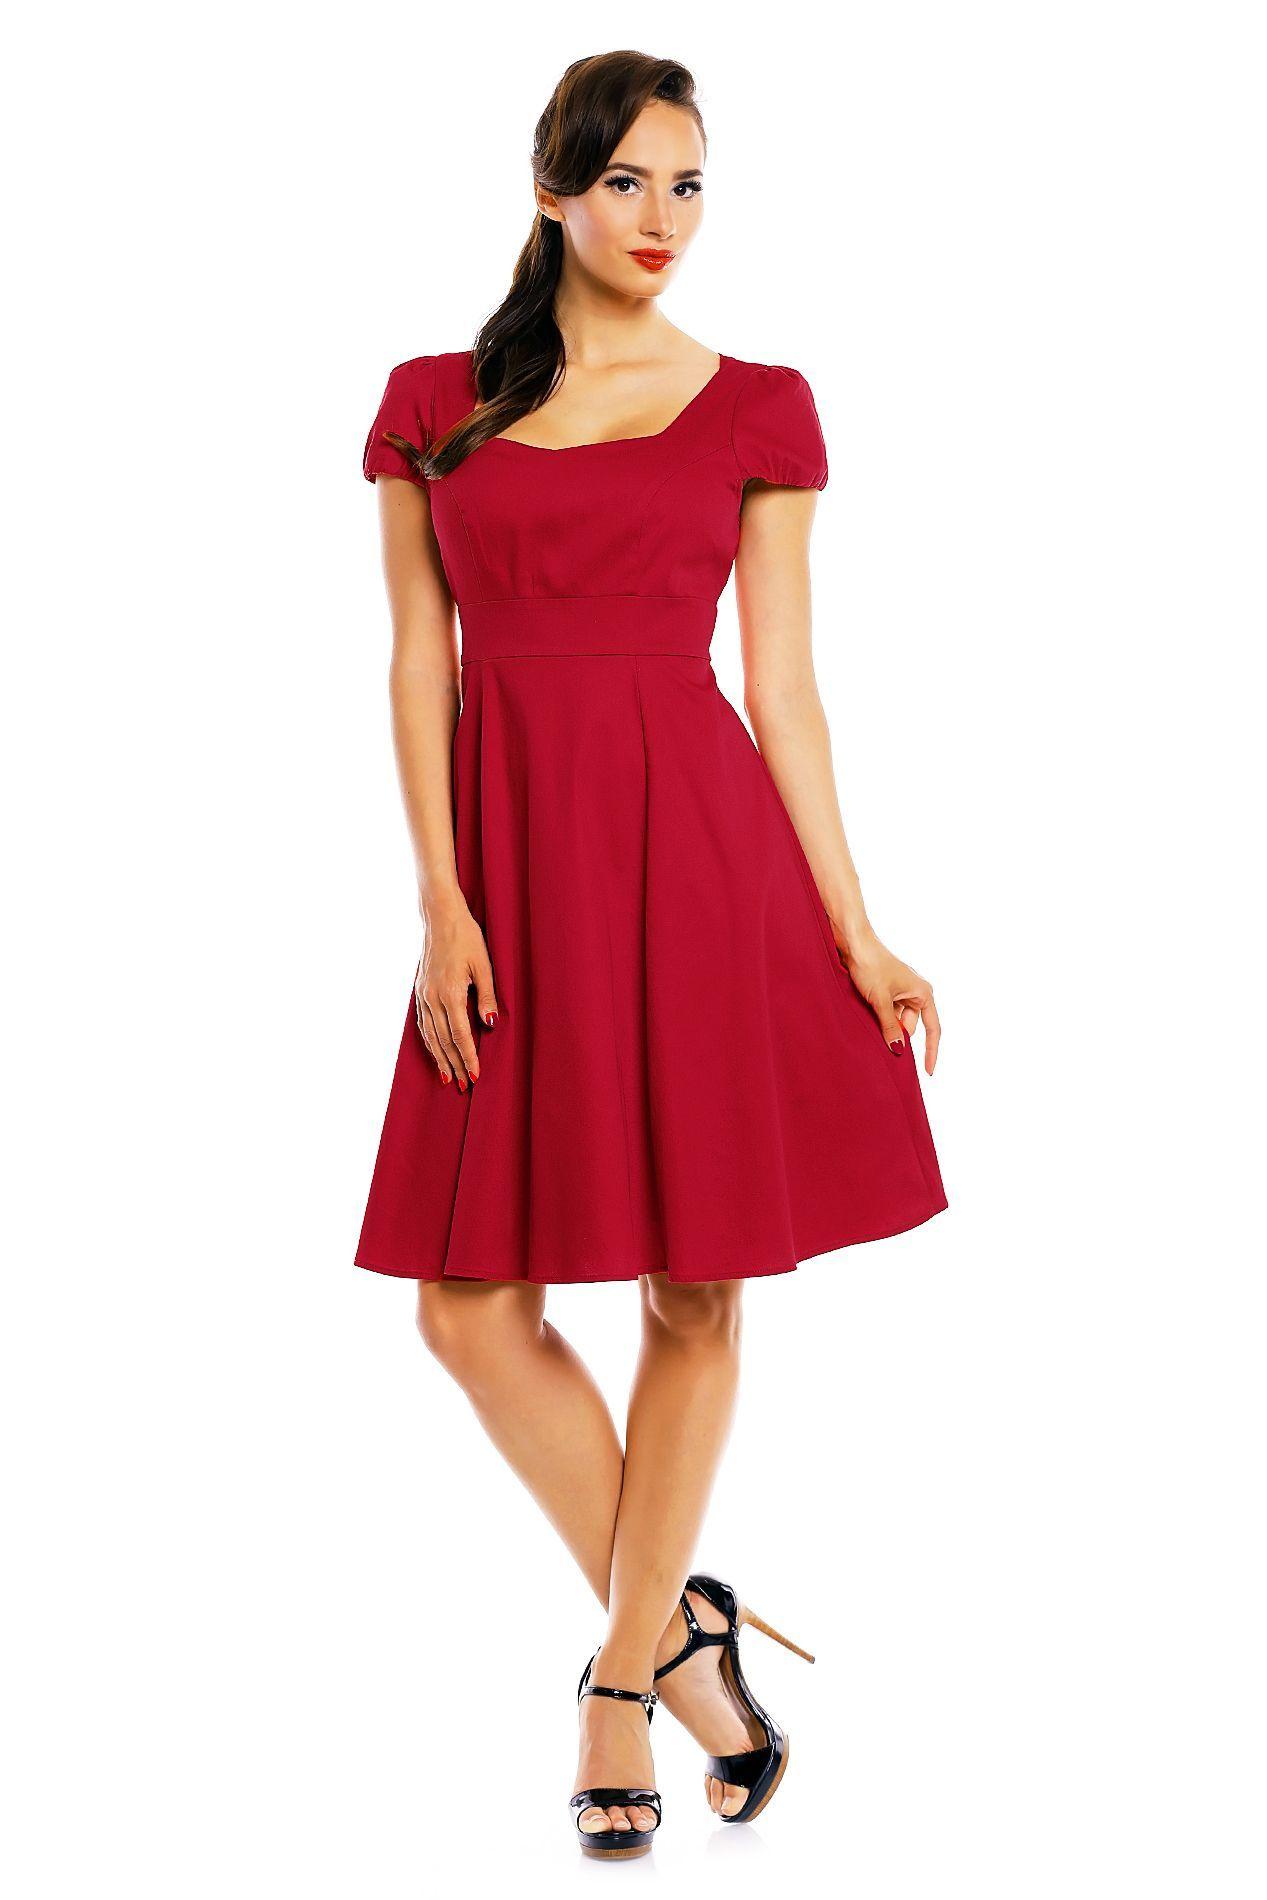 0e92d56d38c0 Claudia Flirty Fifties Style Dress in Plain Red - Swing Dresses